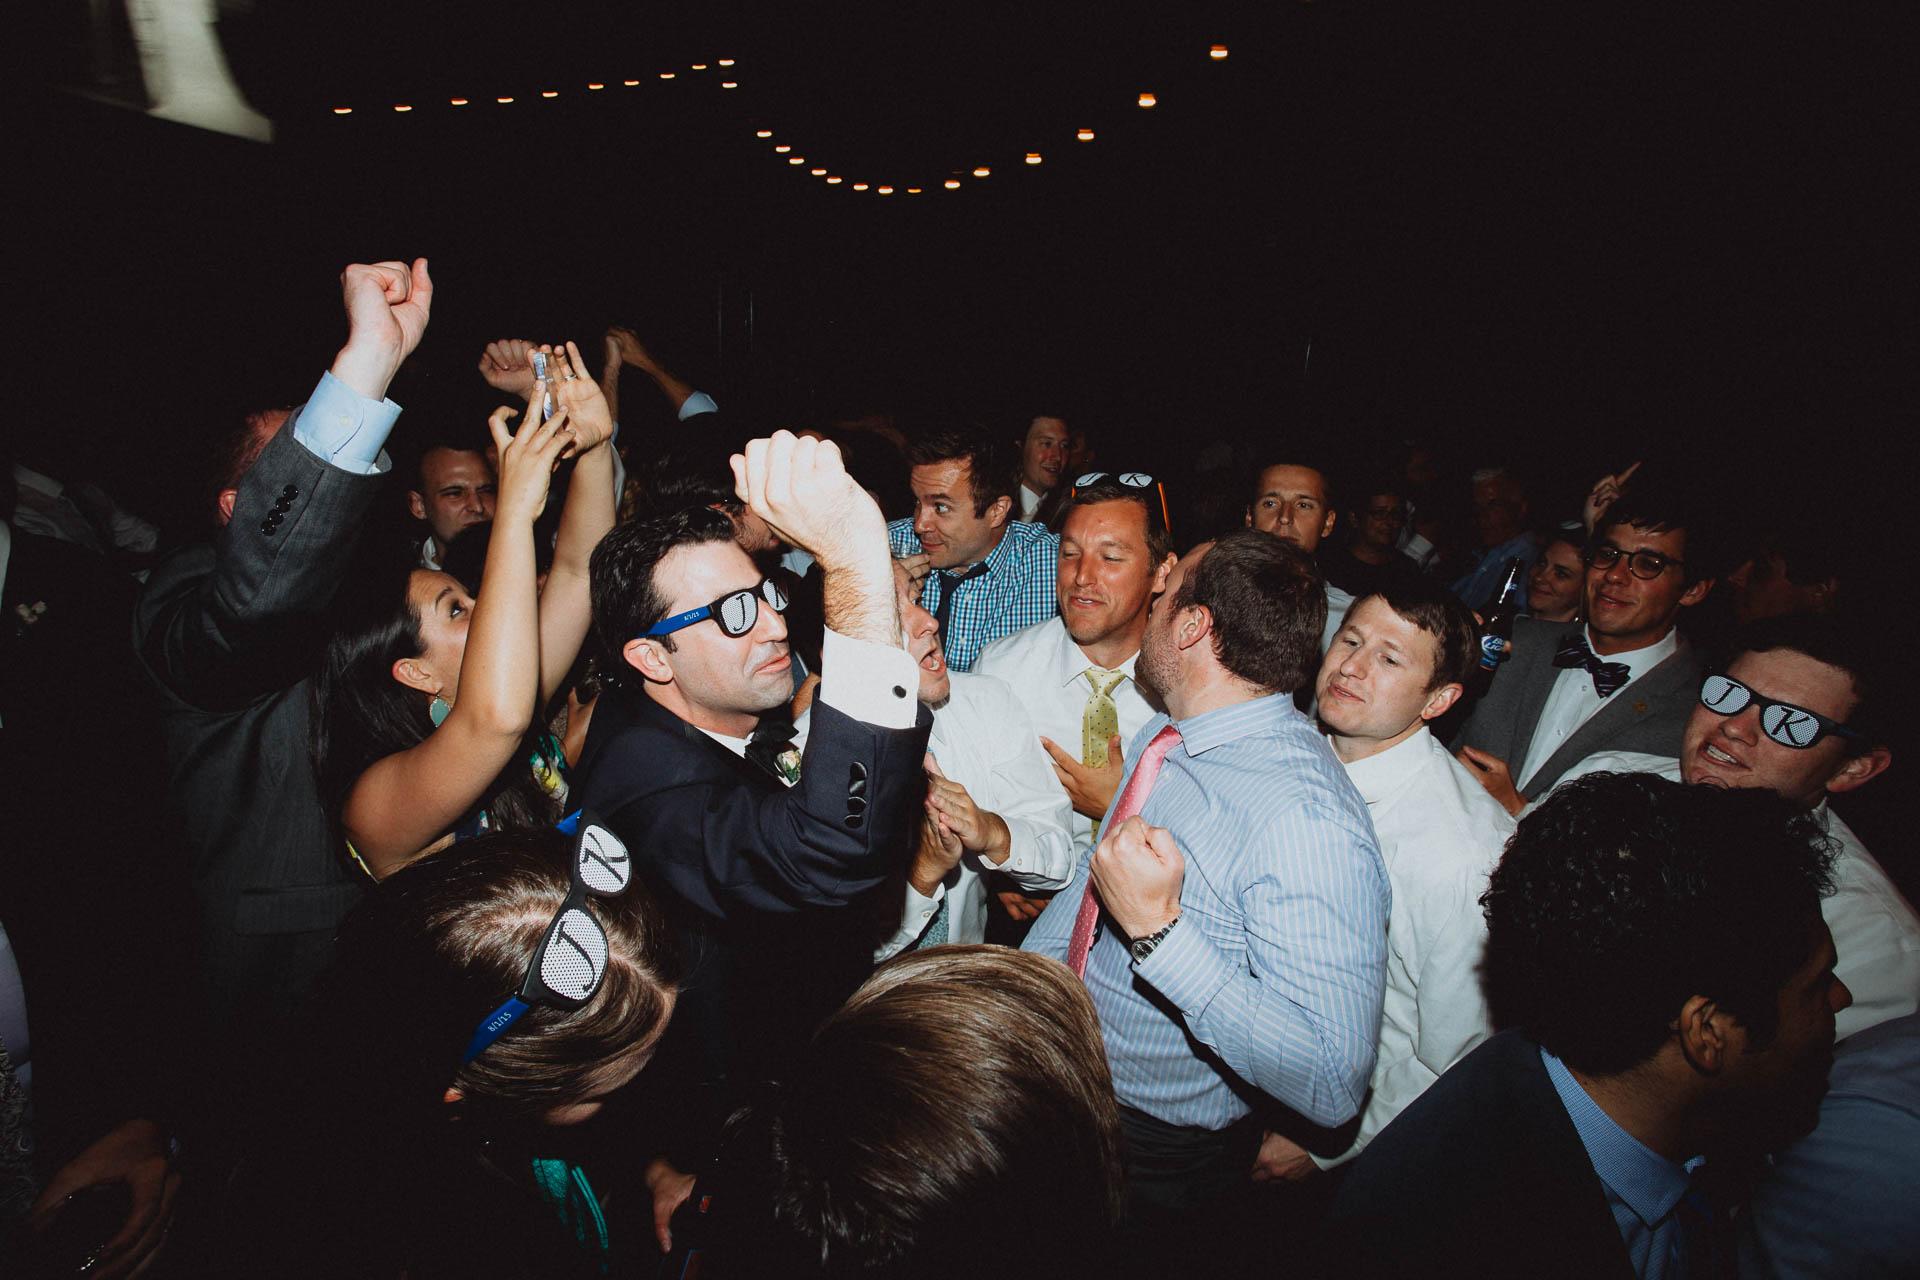 Keri-Joseph-Top-of-the-Market-Wedding-206@2x.jpg